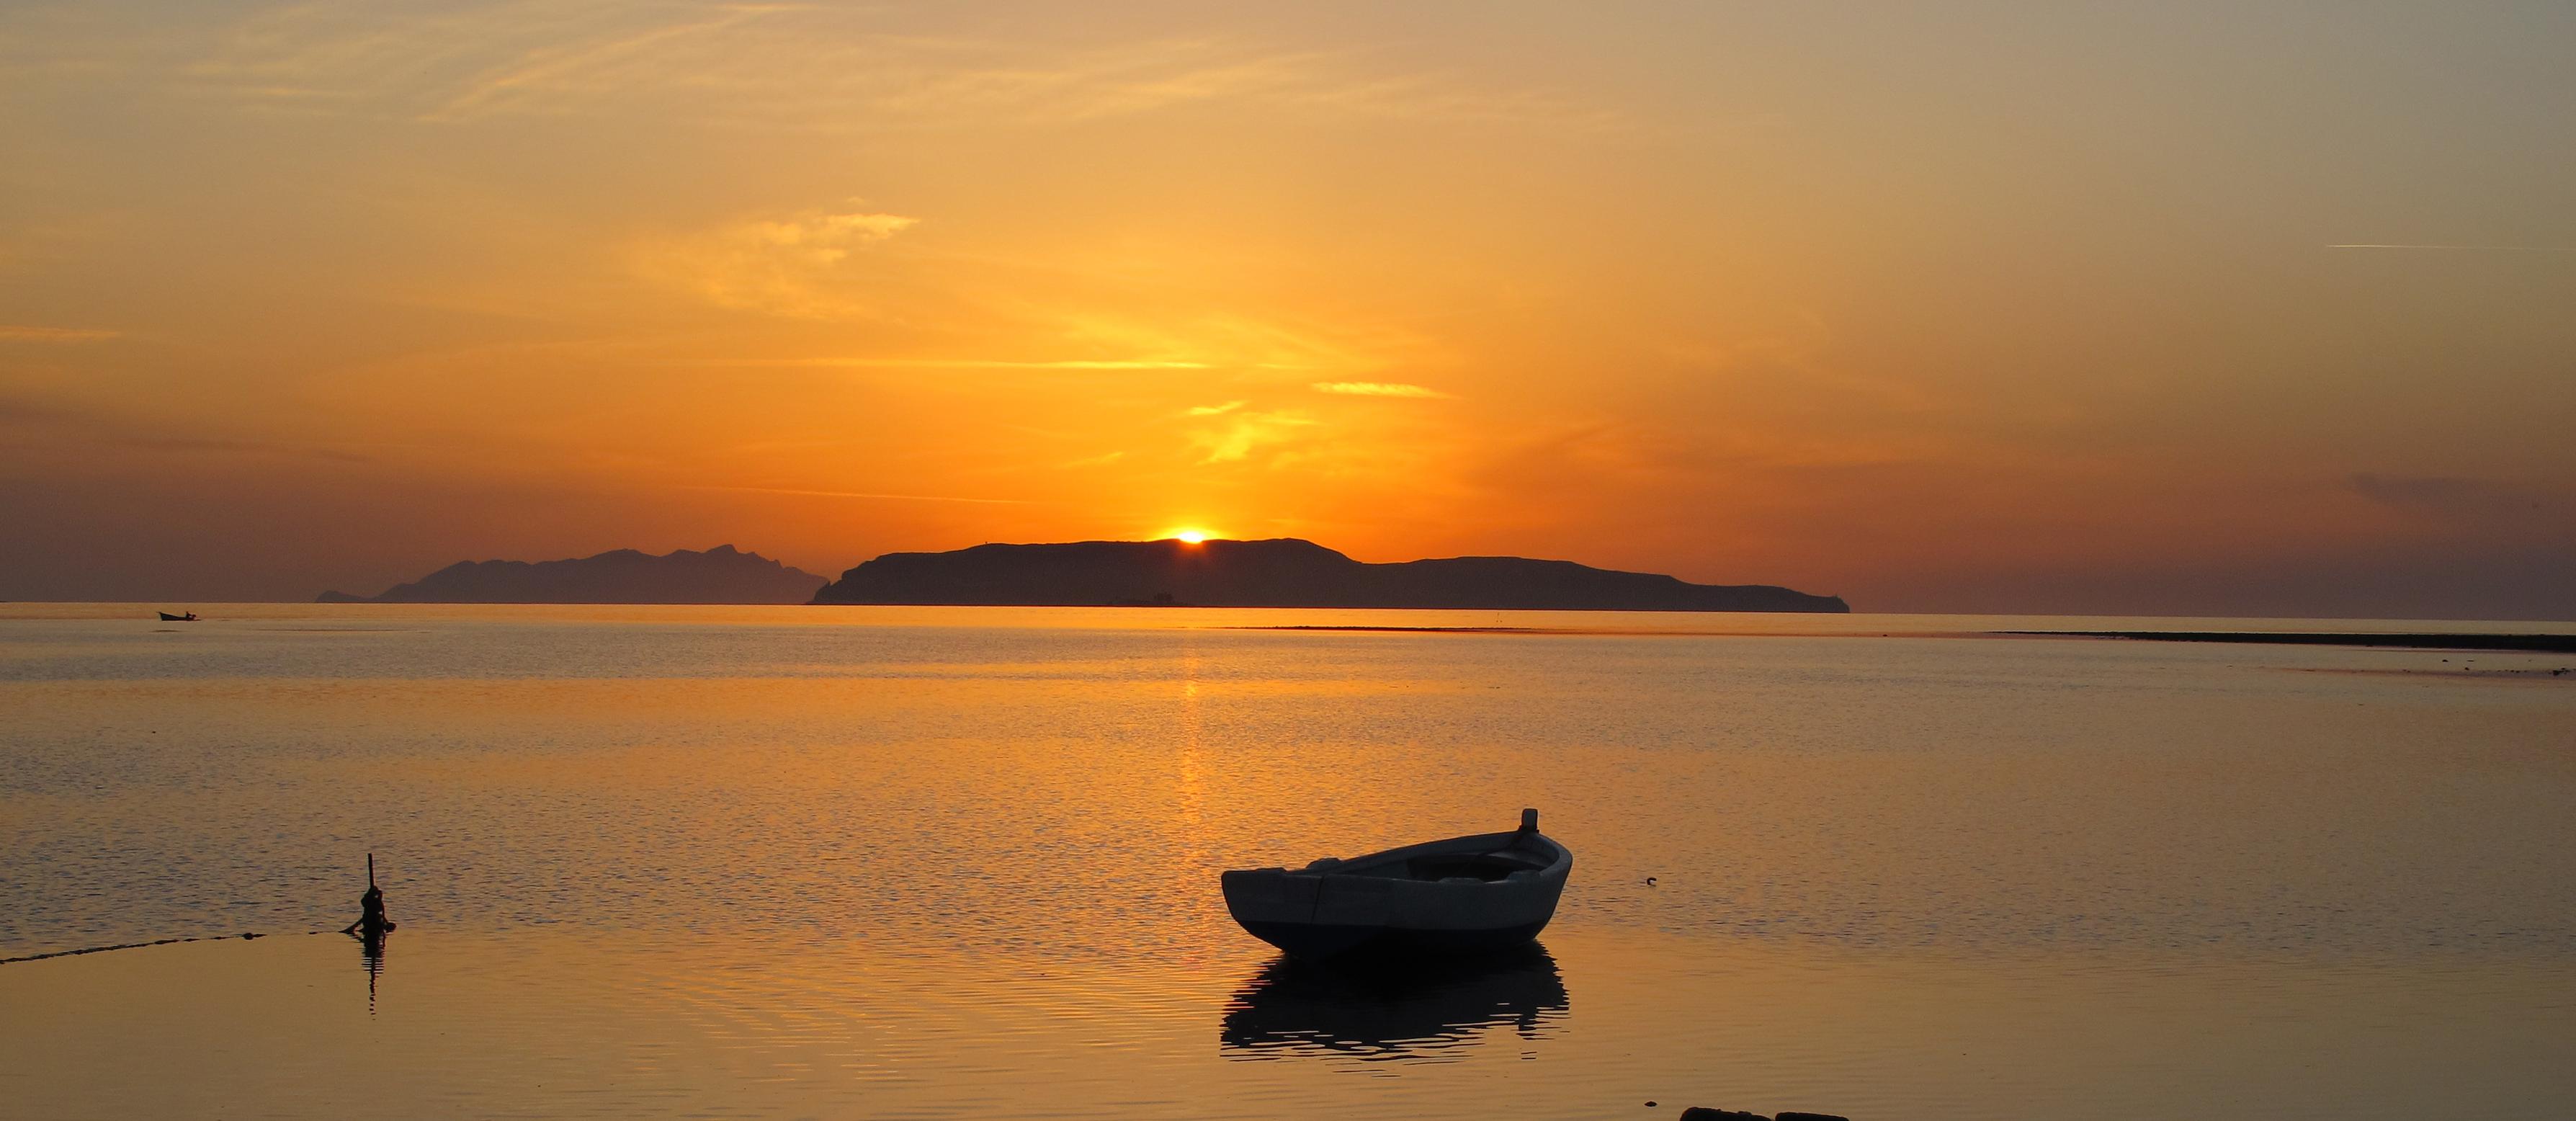 Barca_al_Tramonto